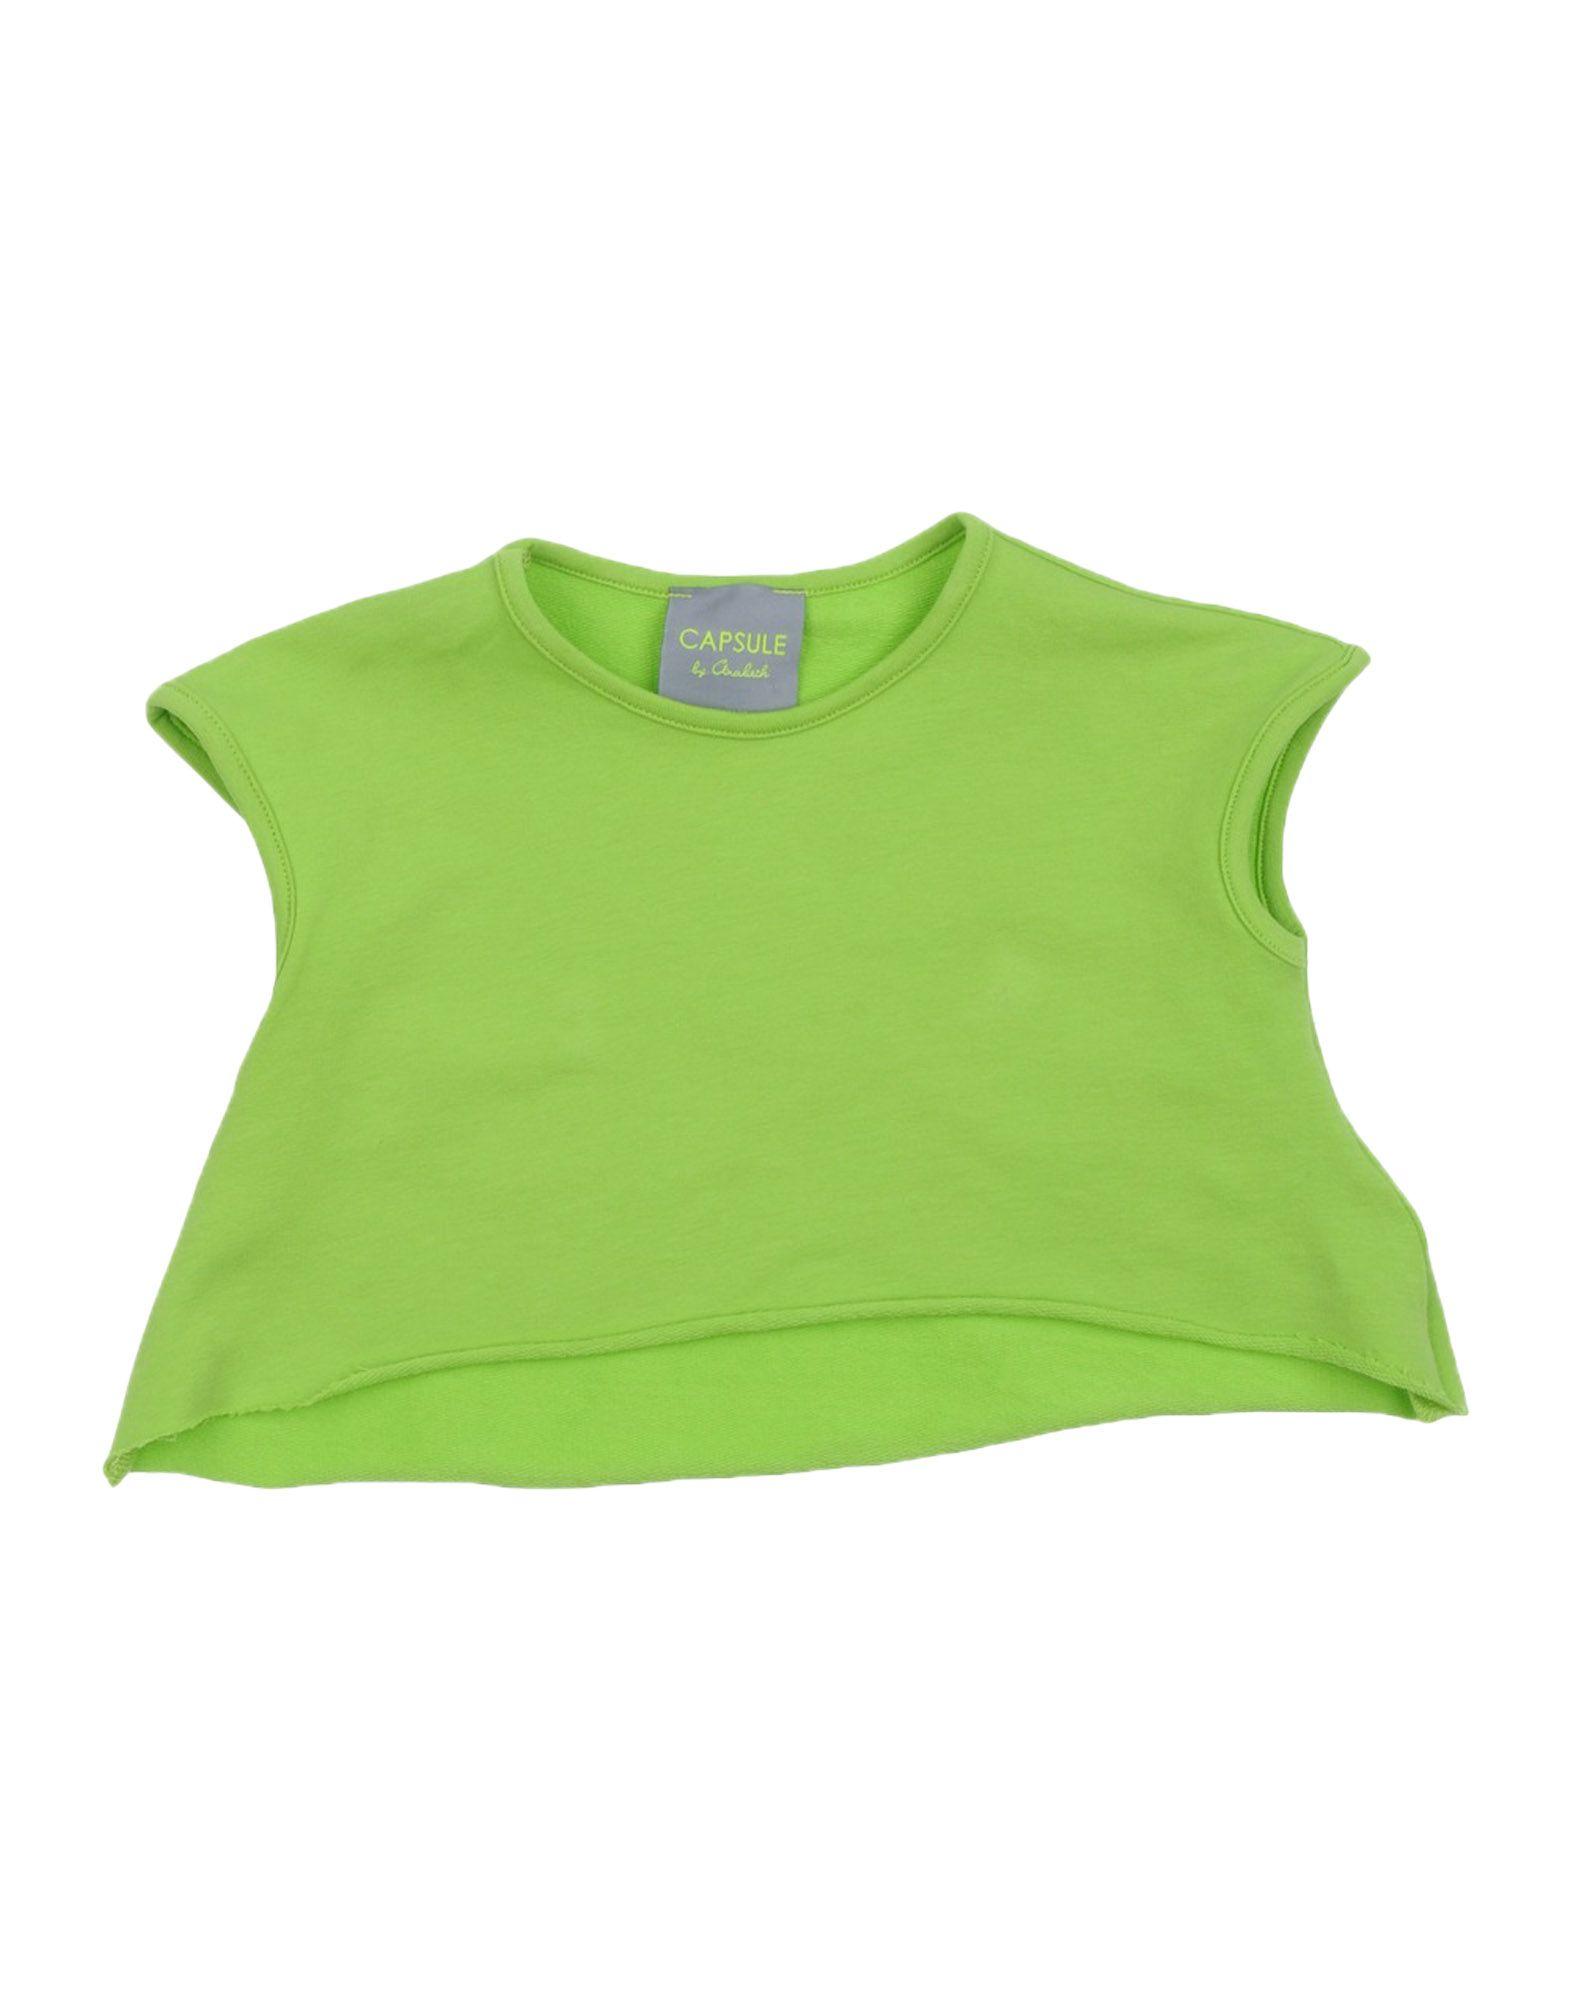 CAPSULE Sweatshirts